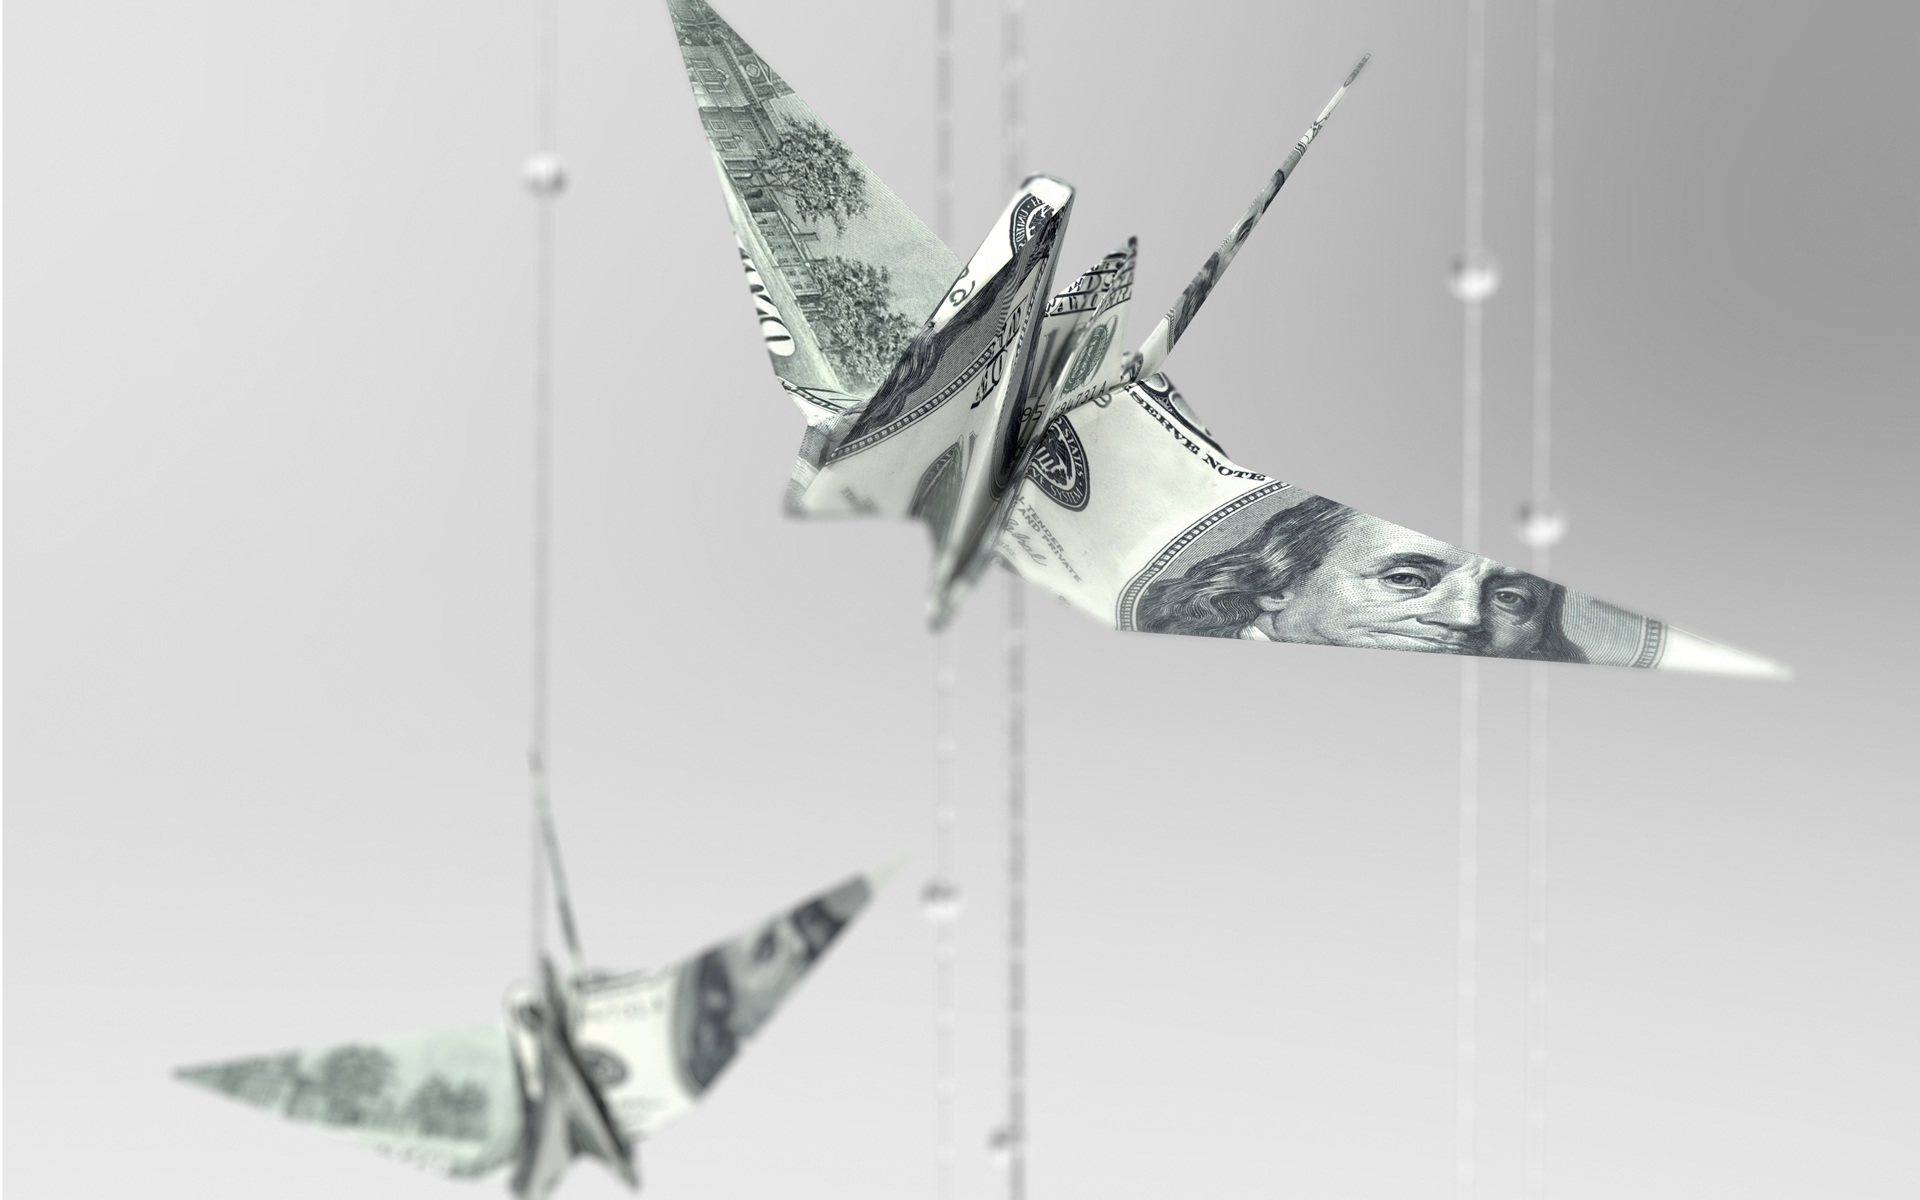 paper cranes made of money